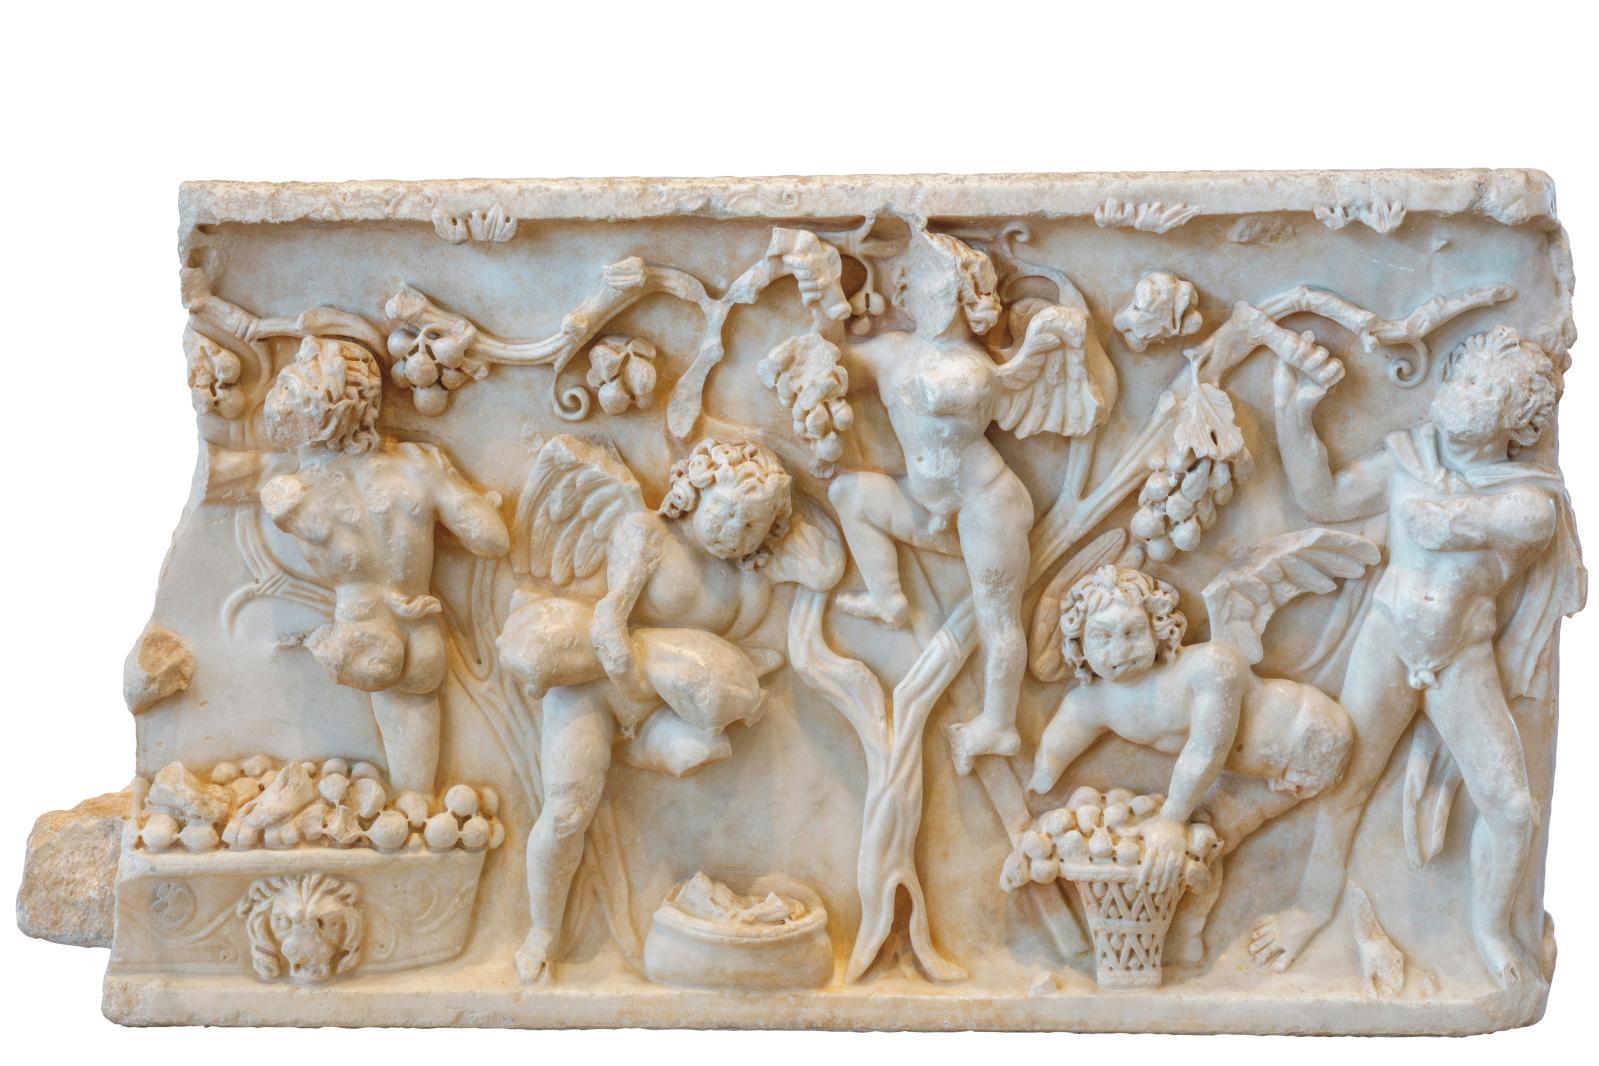 Sarcophage aux Amours vendangeuses, IIe siècle, marbre, Les Amarats, Narbonne.© Arnaud Späni/Narbo Via